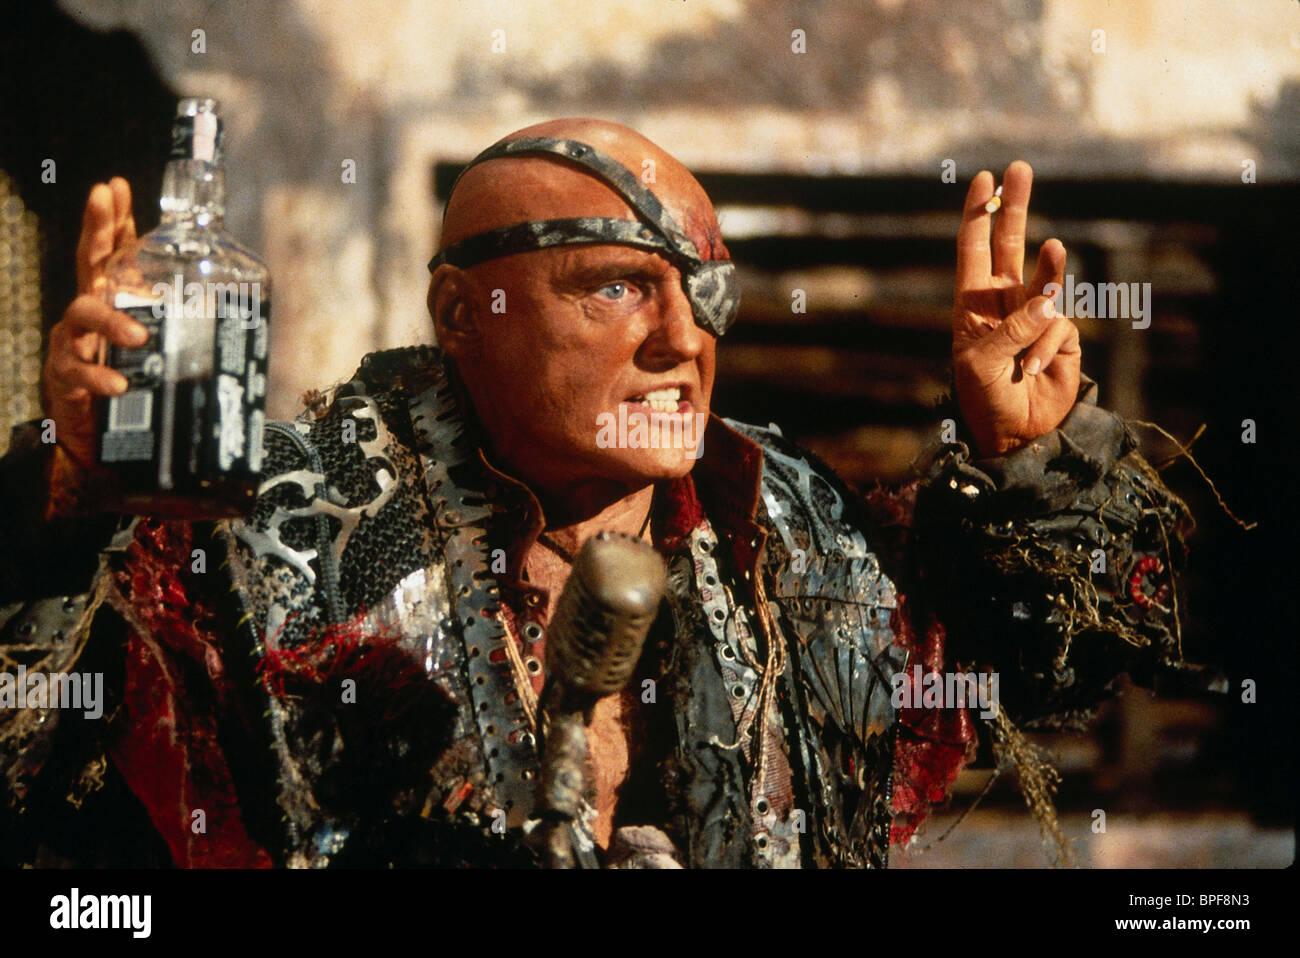 DENNIS HOPPER WATERWORLD (1995) - Stock Image